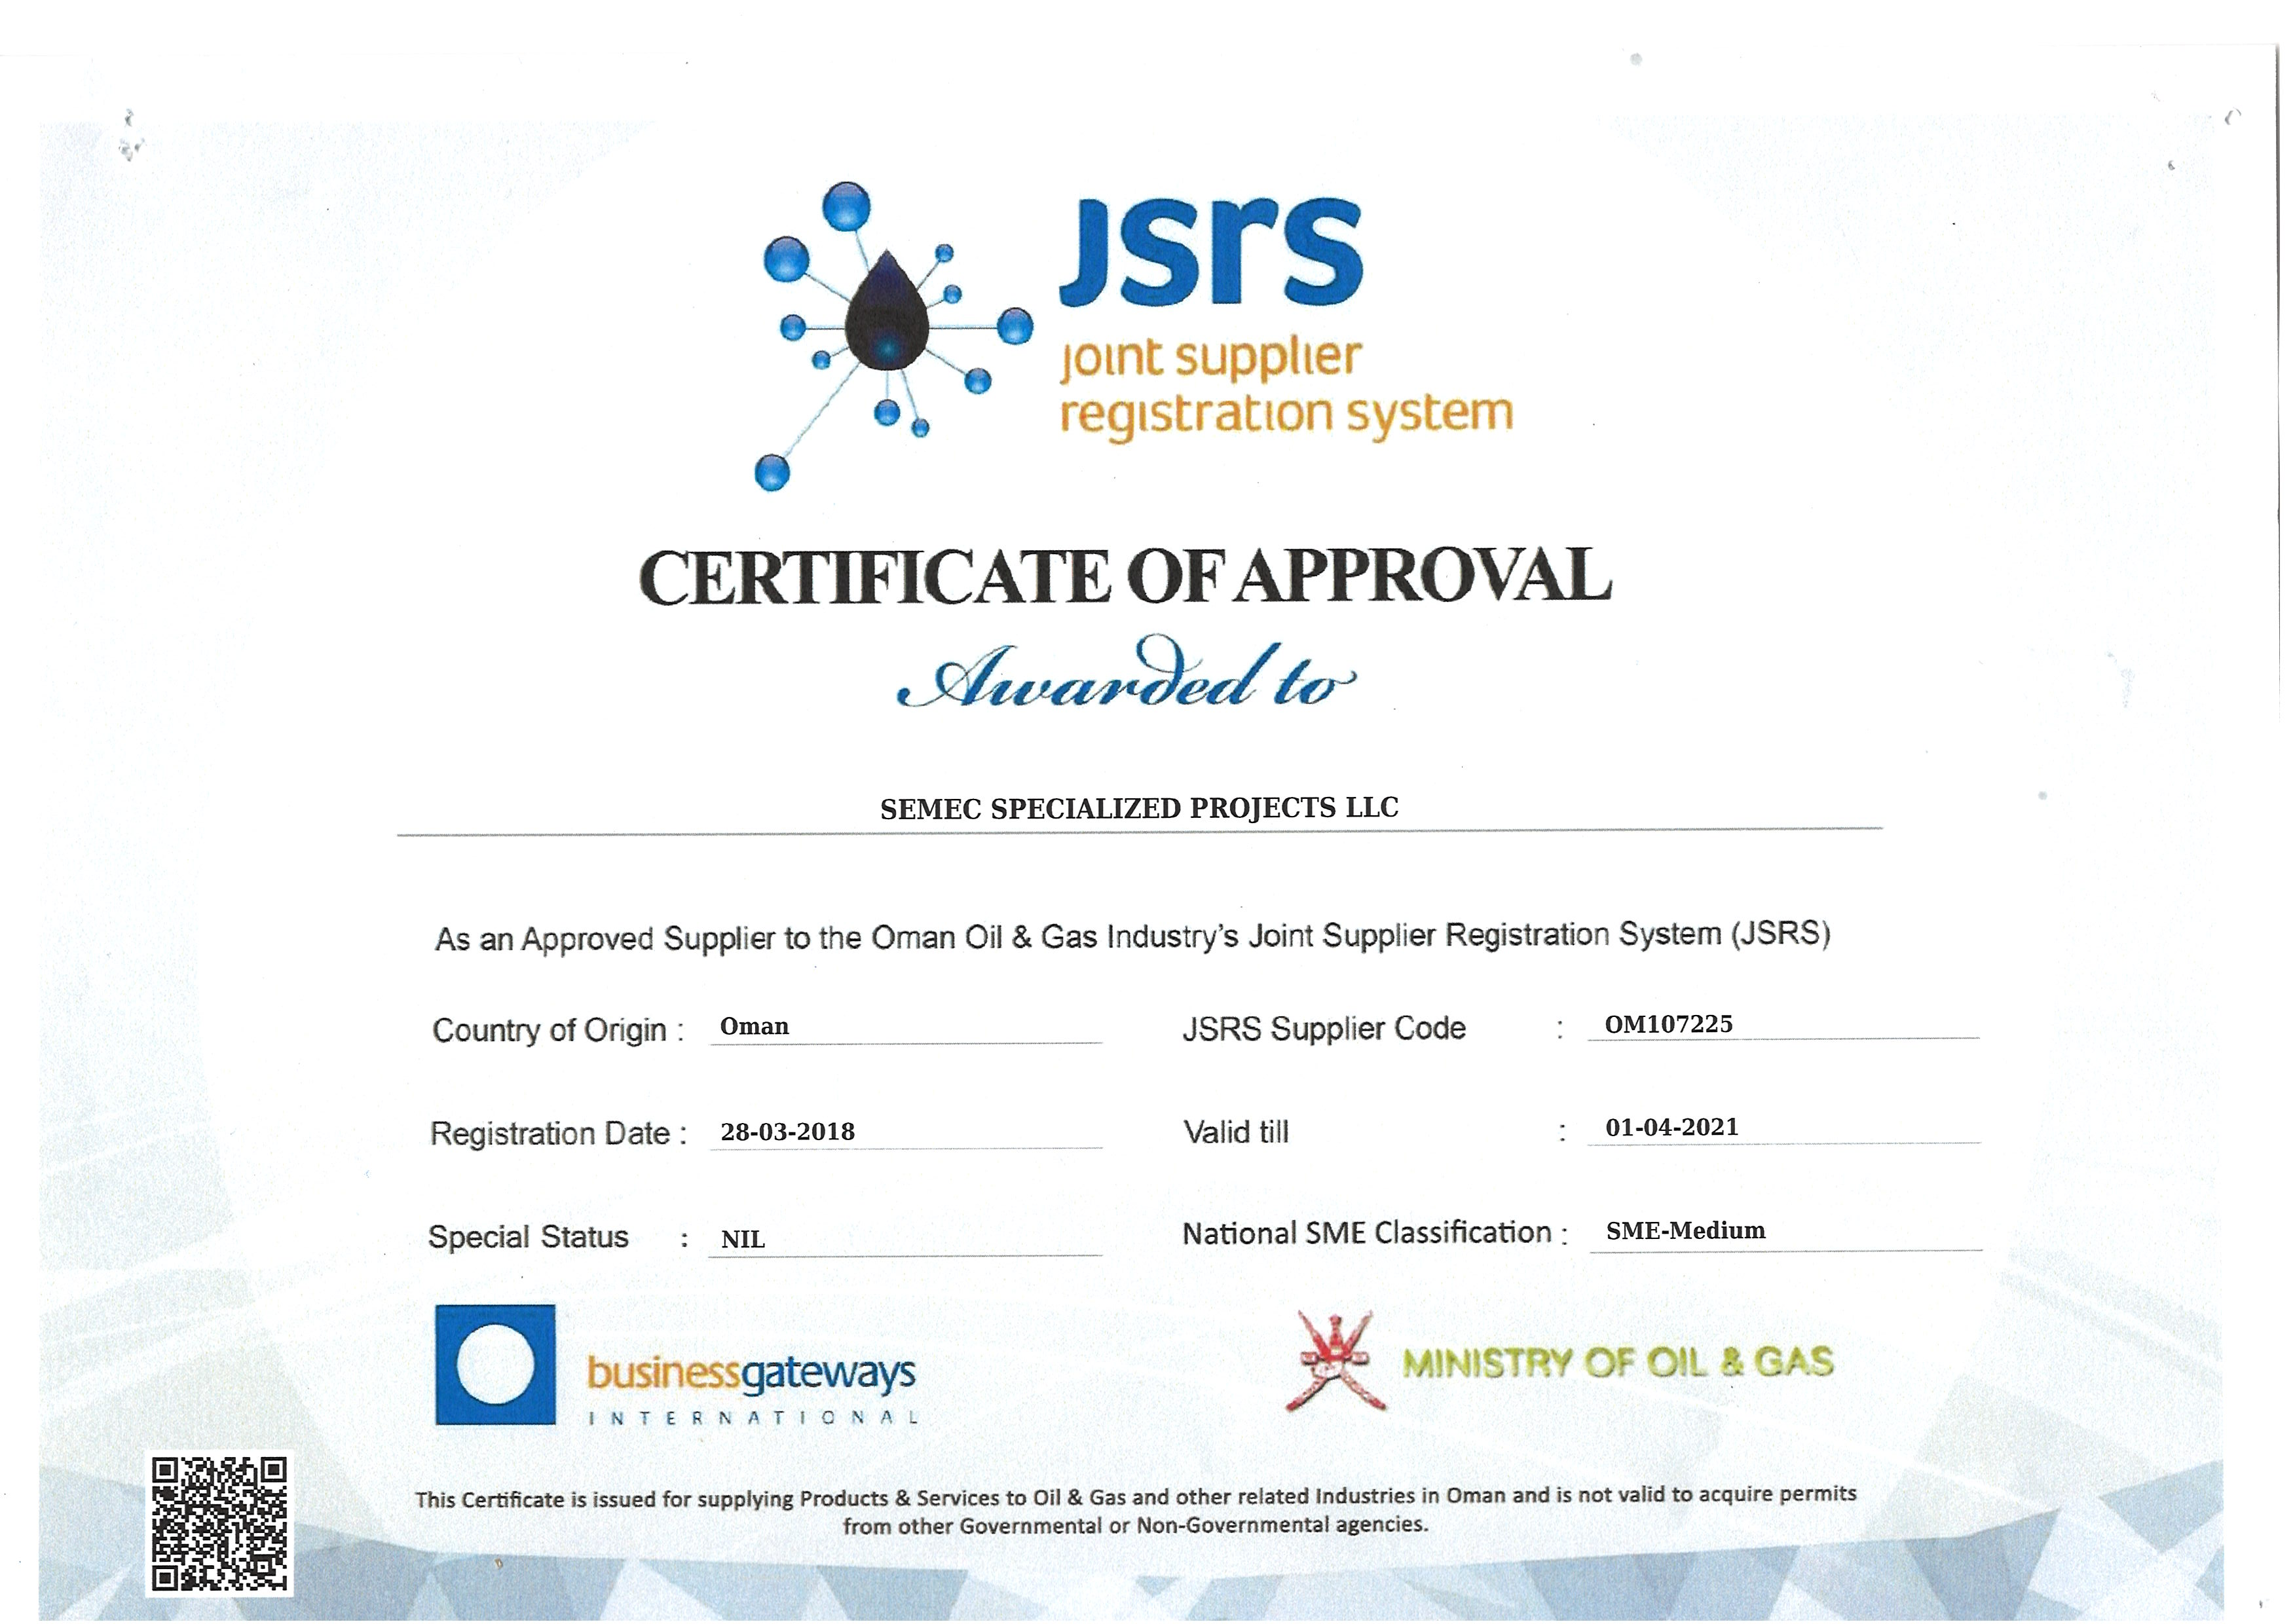 SEMEC Specialized Projects LLC - Construction Management